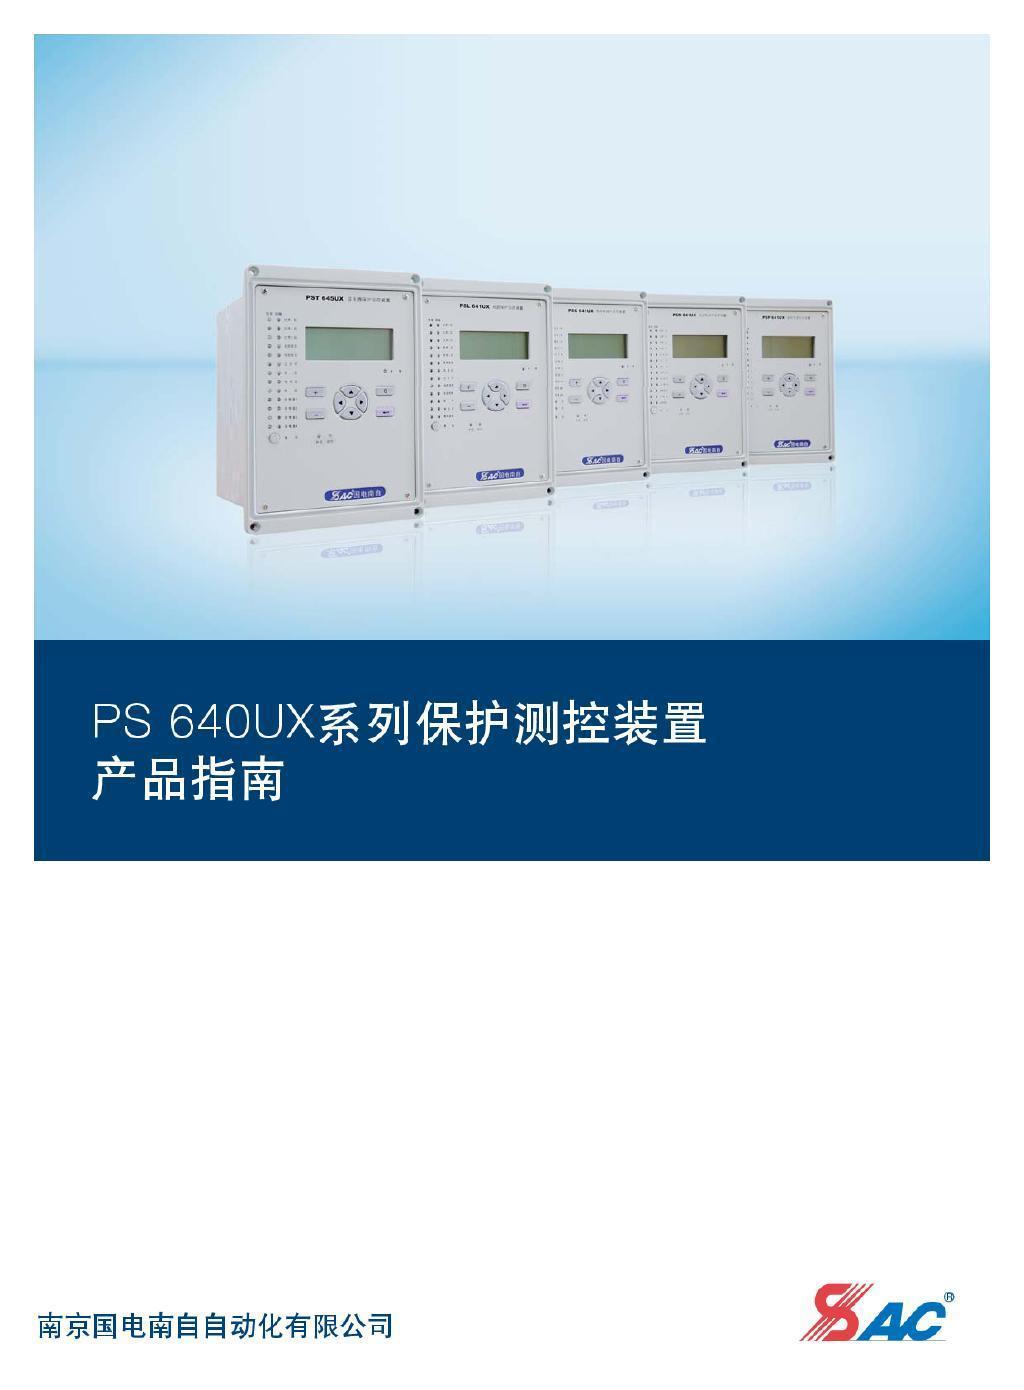 640UX产品指南8.3